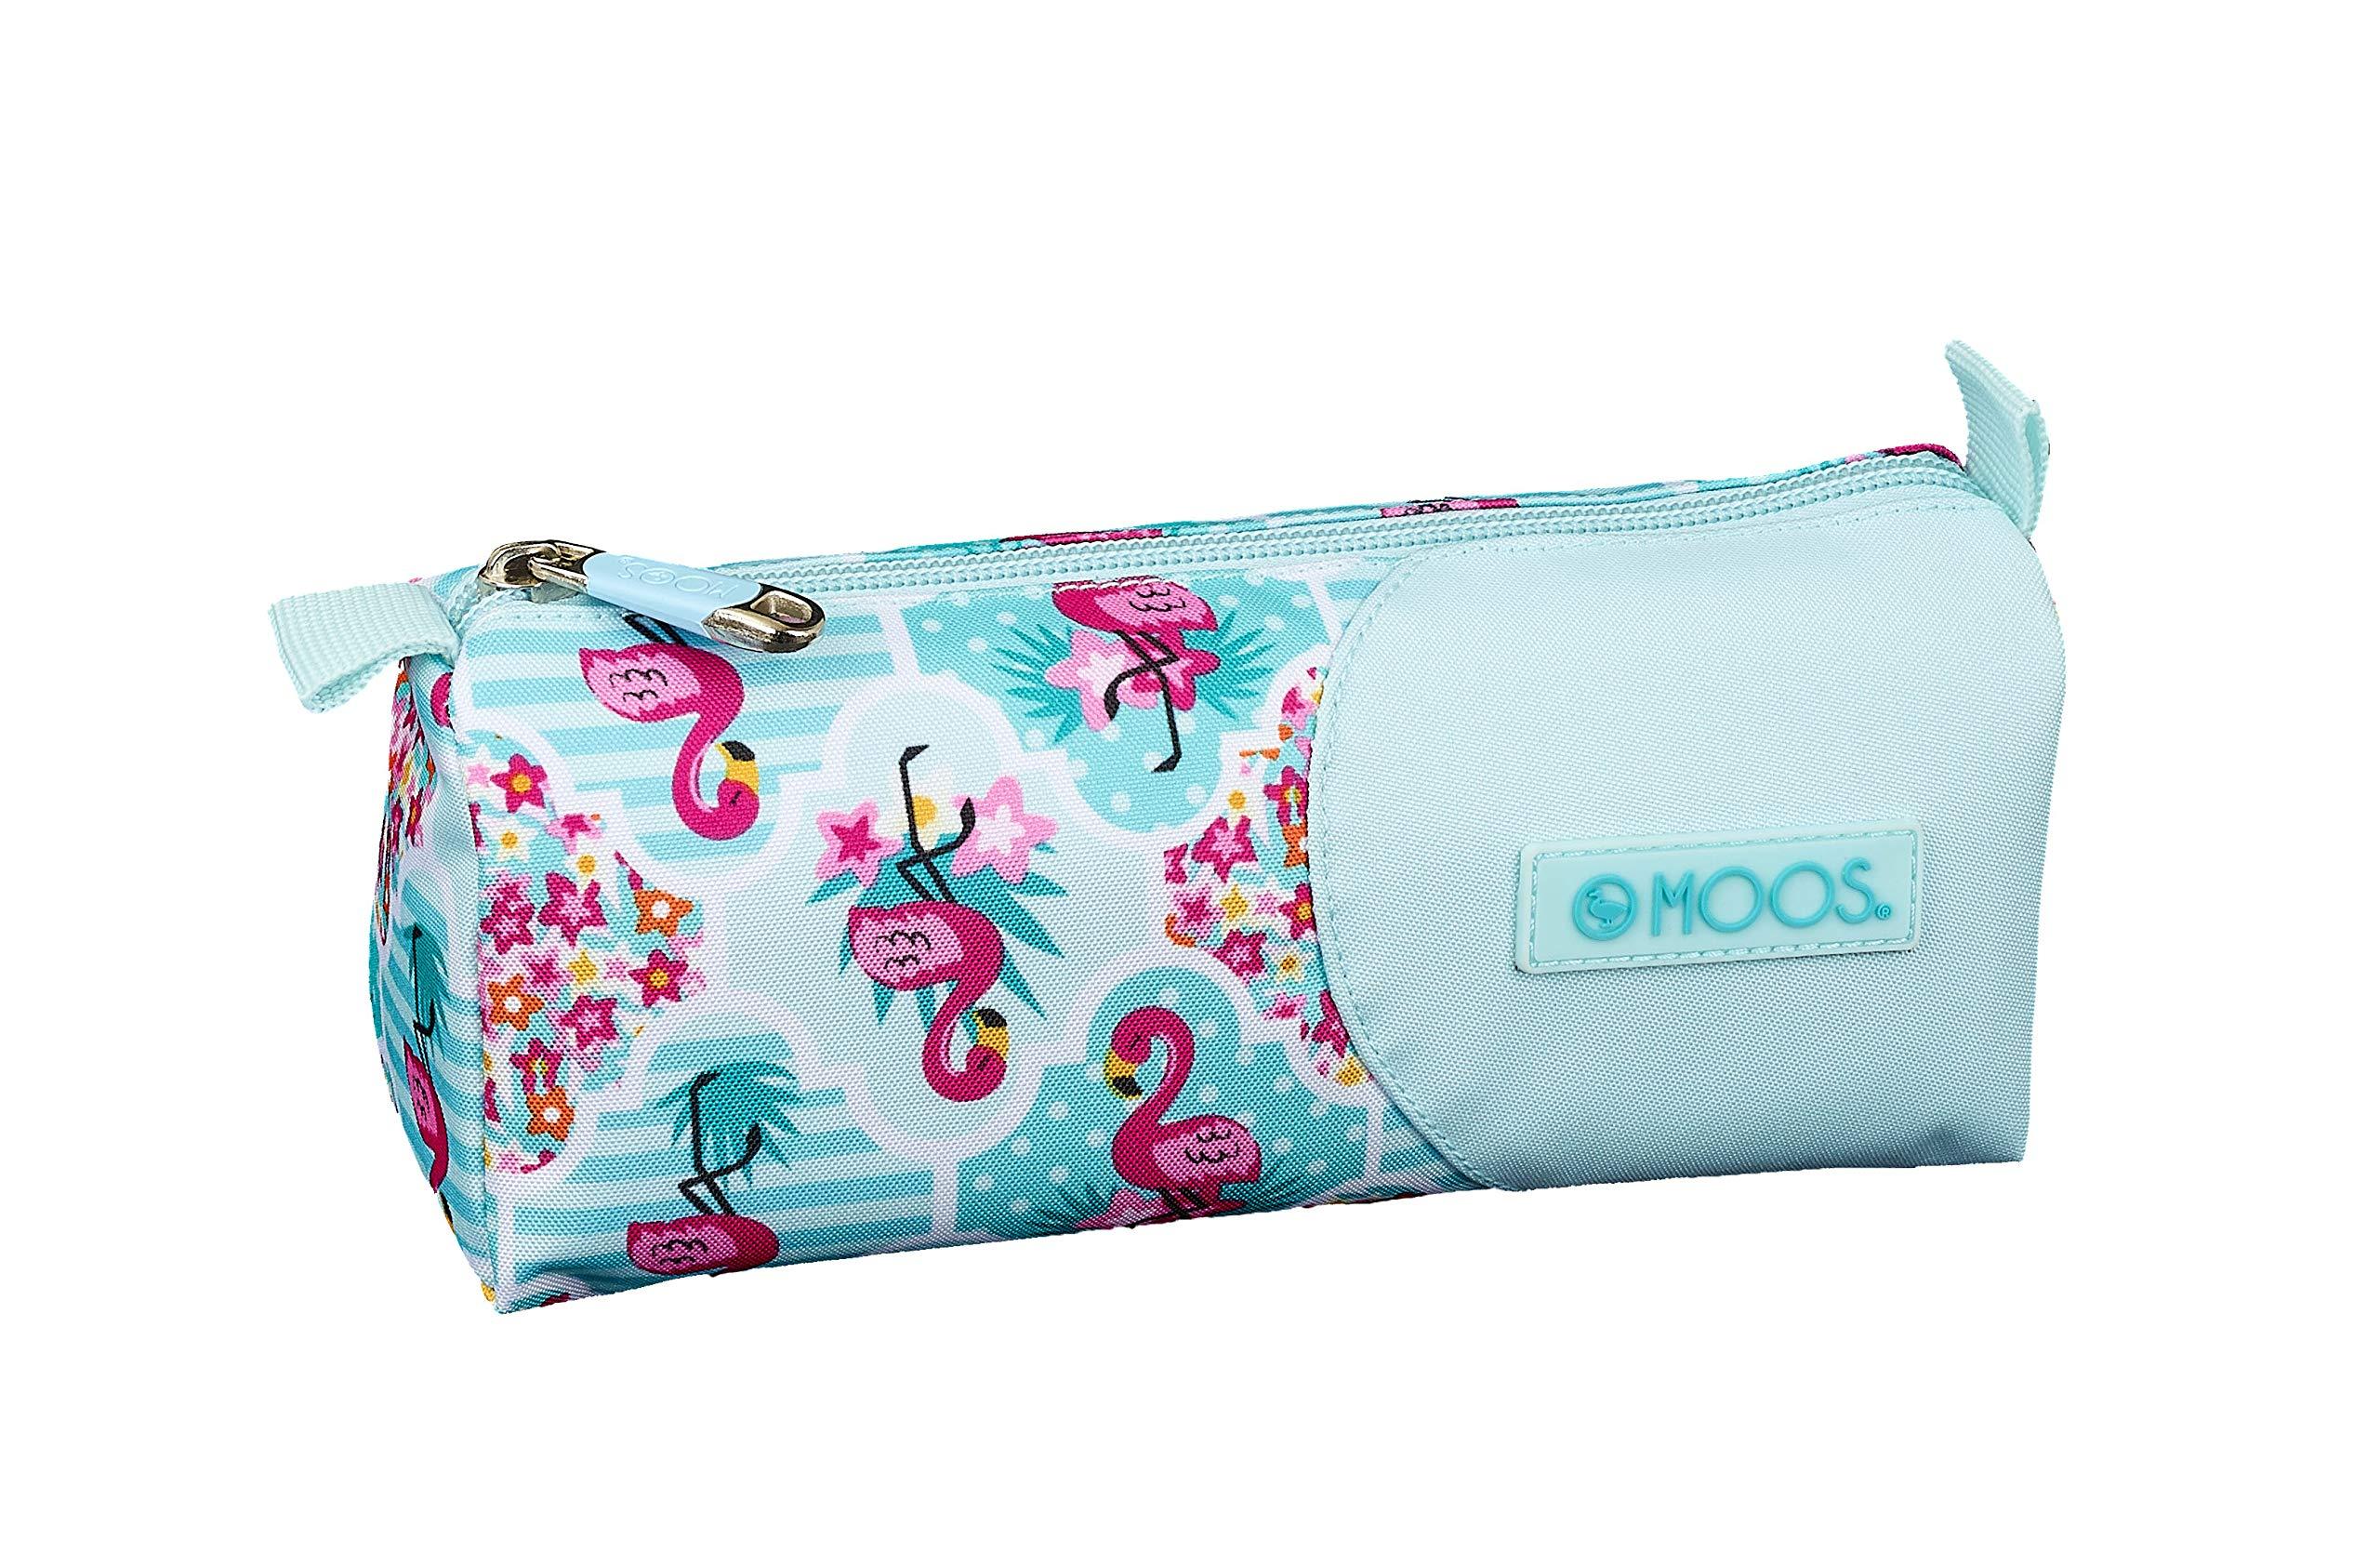 Moos  Flamingo Turquoise Oficial Estuche Escolar 210x70x80mm